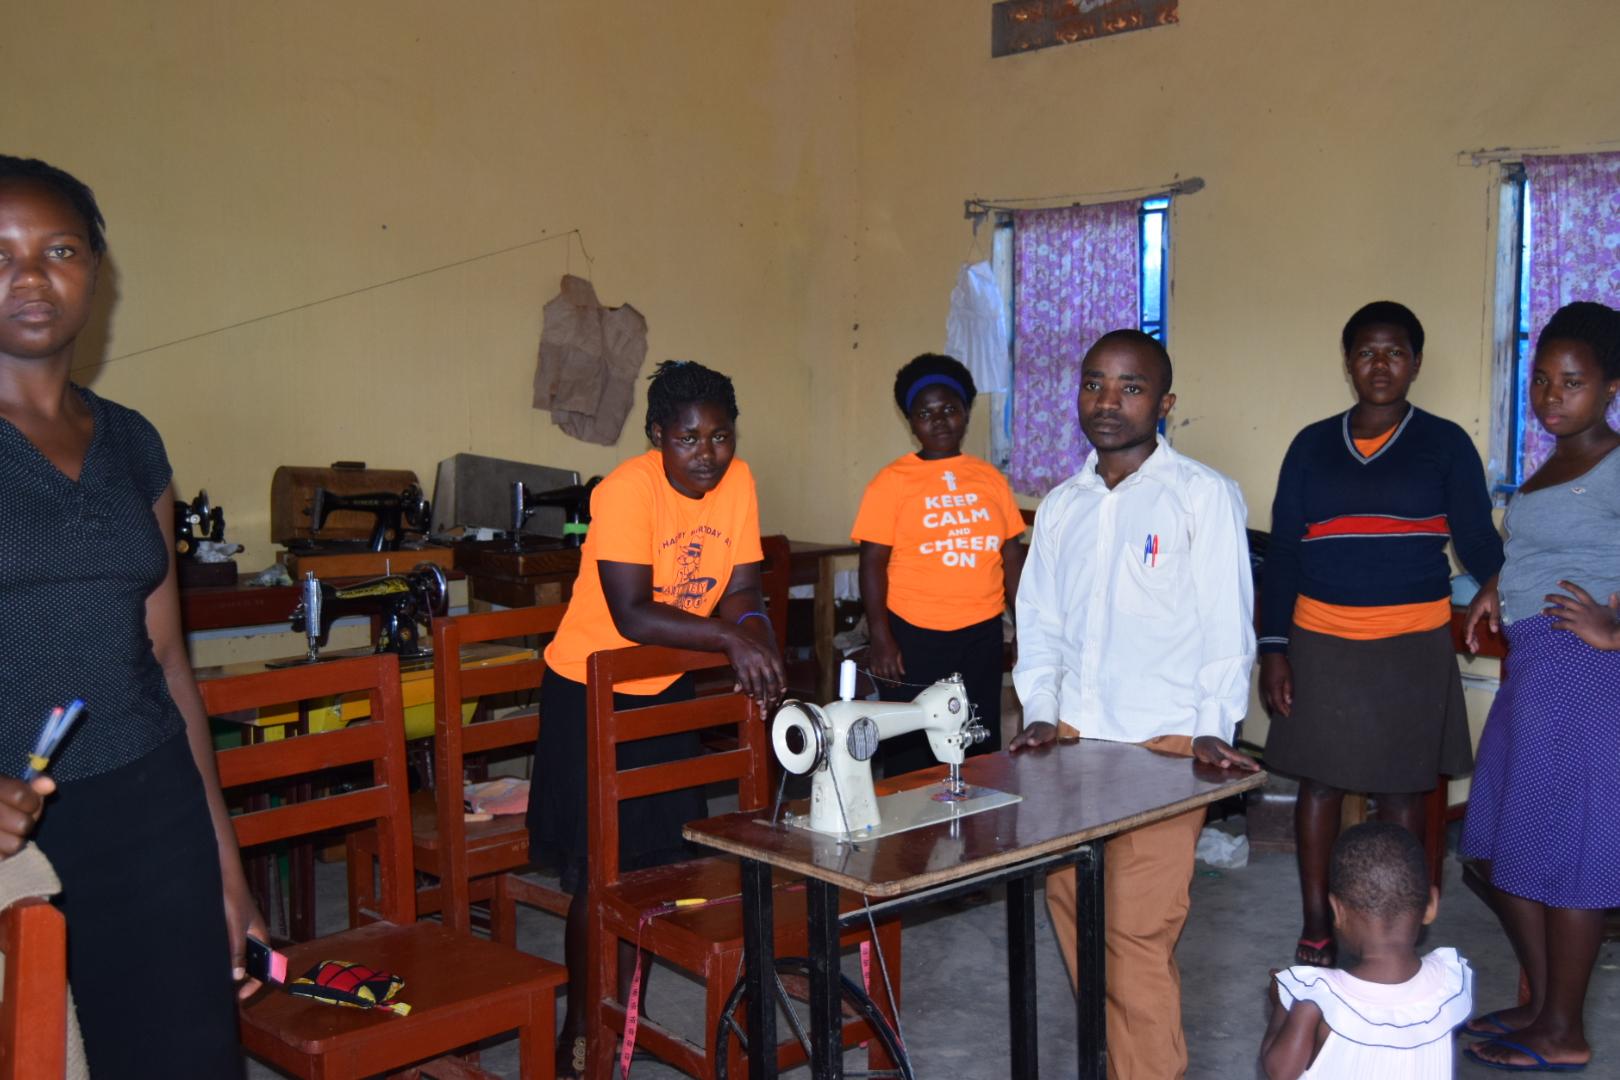 Taken August 2017, World Shine School Uganda